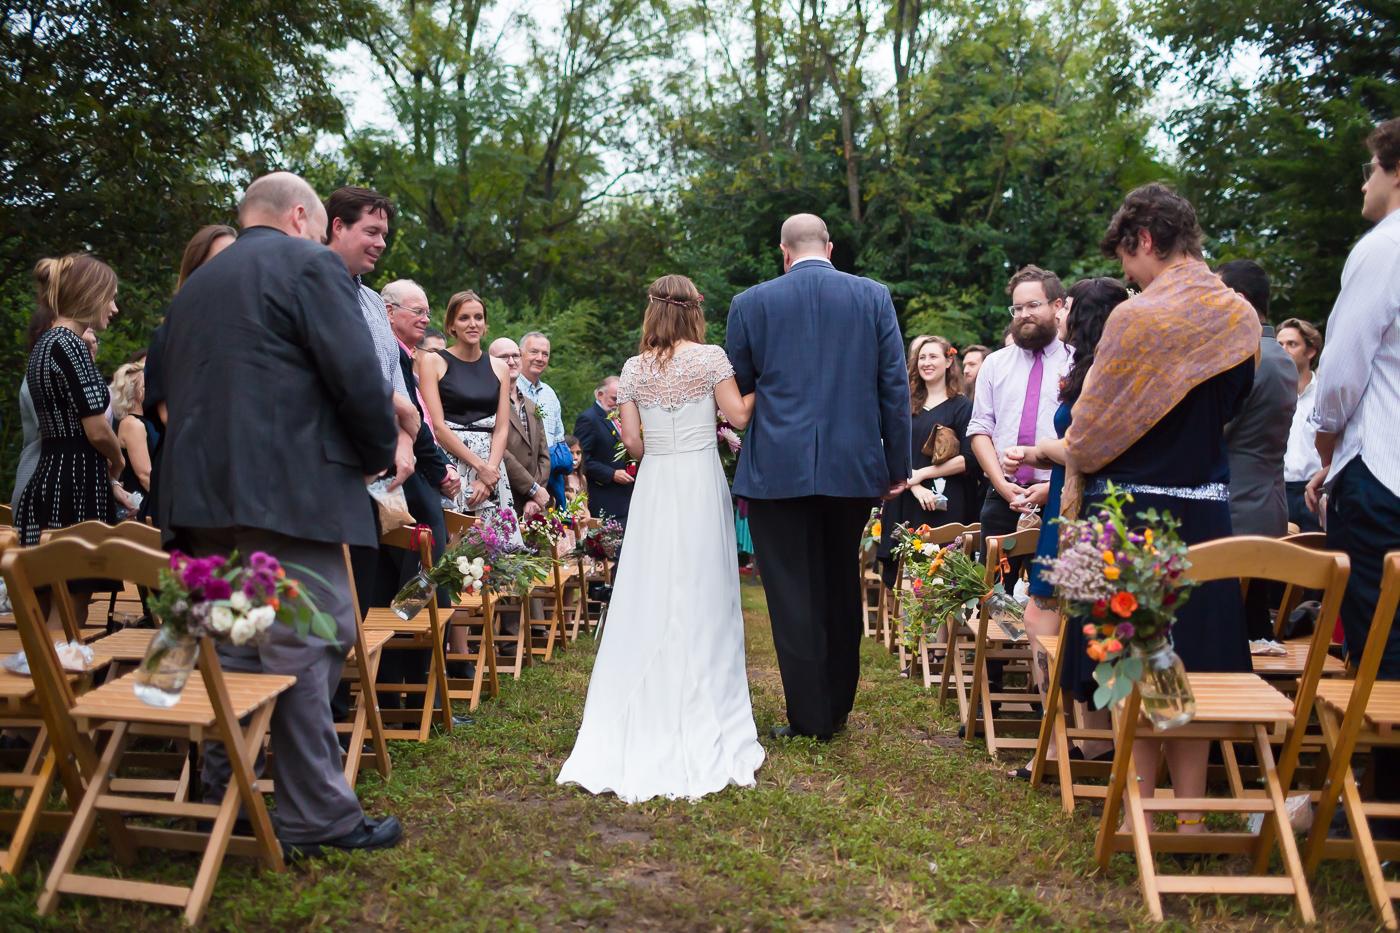 austin-wedding-photographer-videographer-003.jpg